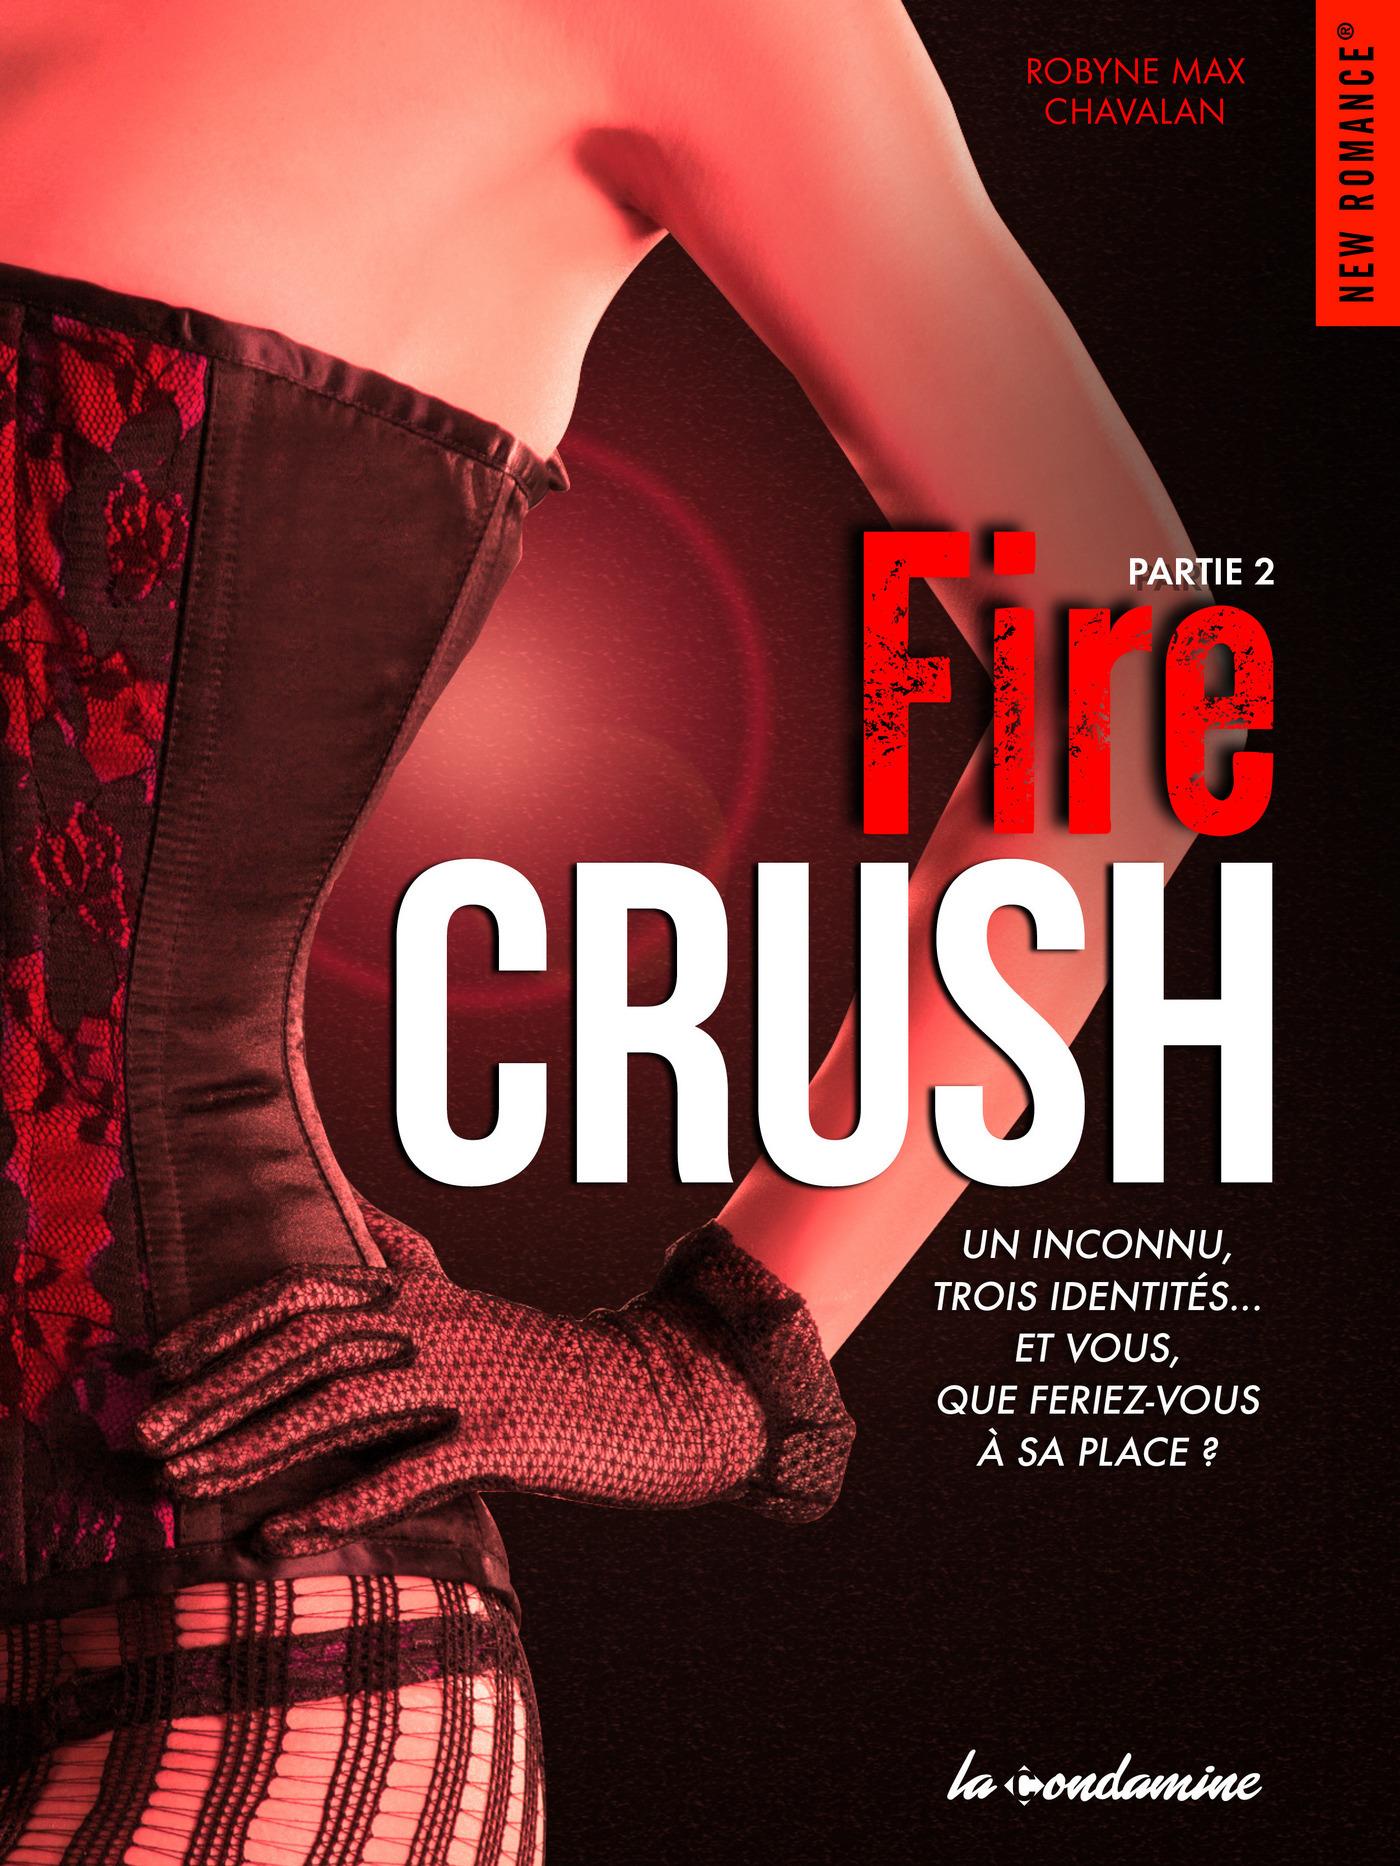 Fire Crush Partie 2